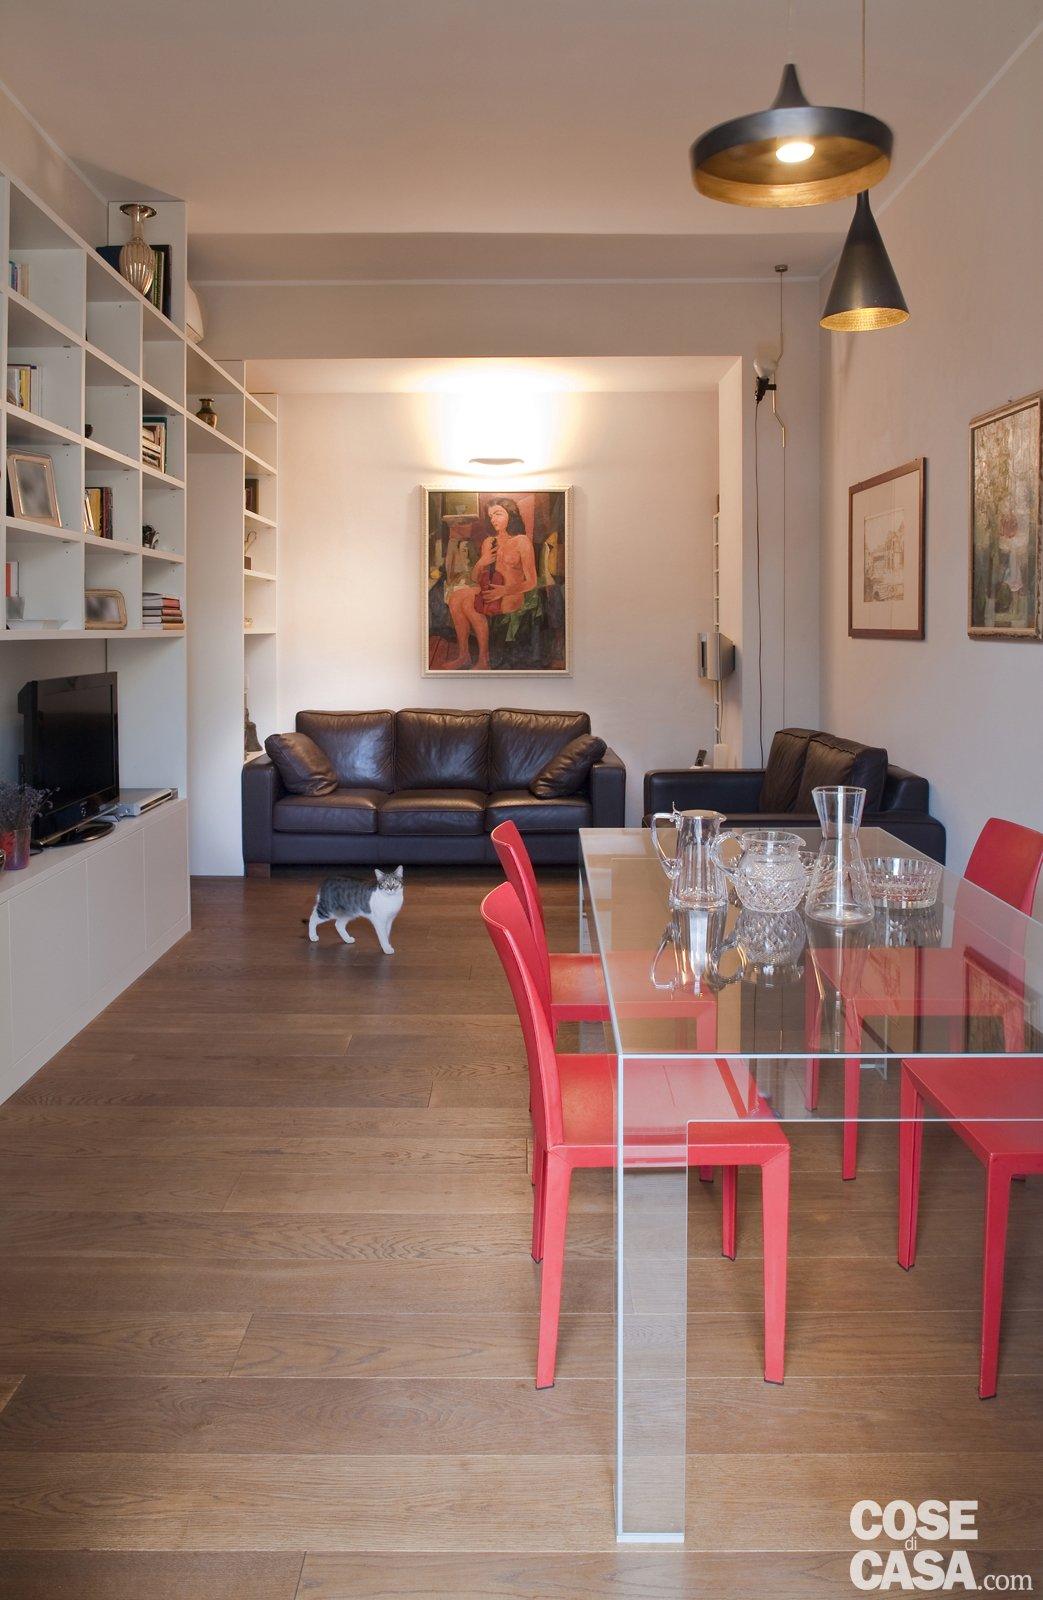 Una casa di 80 mq superfunzionali cose di casa - Ristrutturare e arredare casa ...